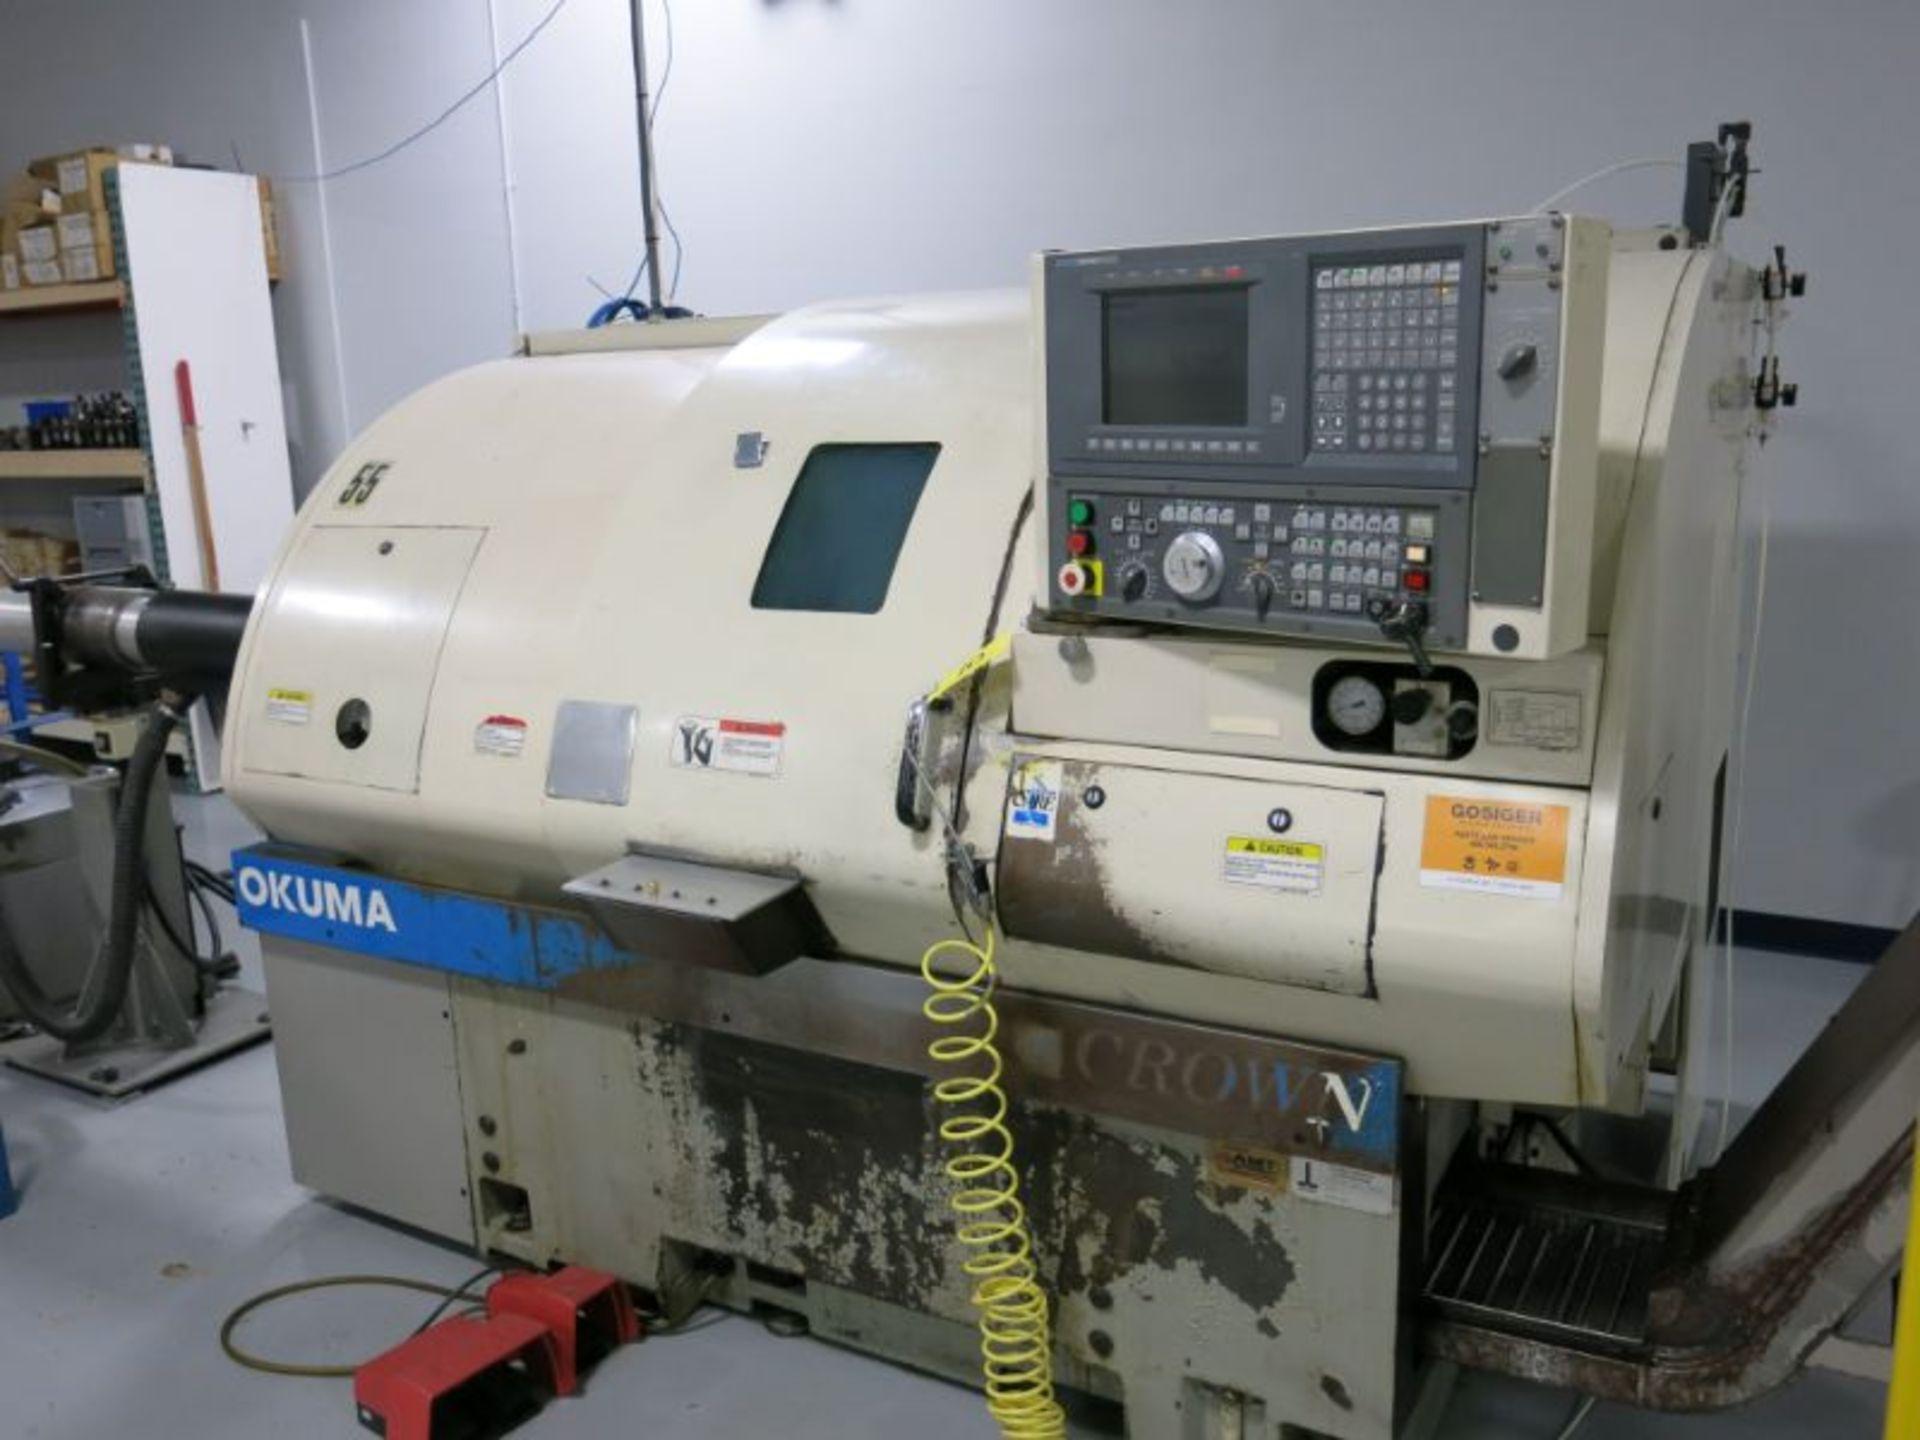 1998 Okuma 762E Crown CNC Turning Center - Image 2 of 5